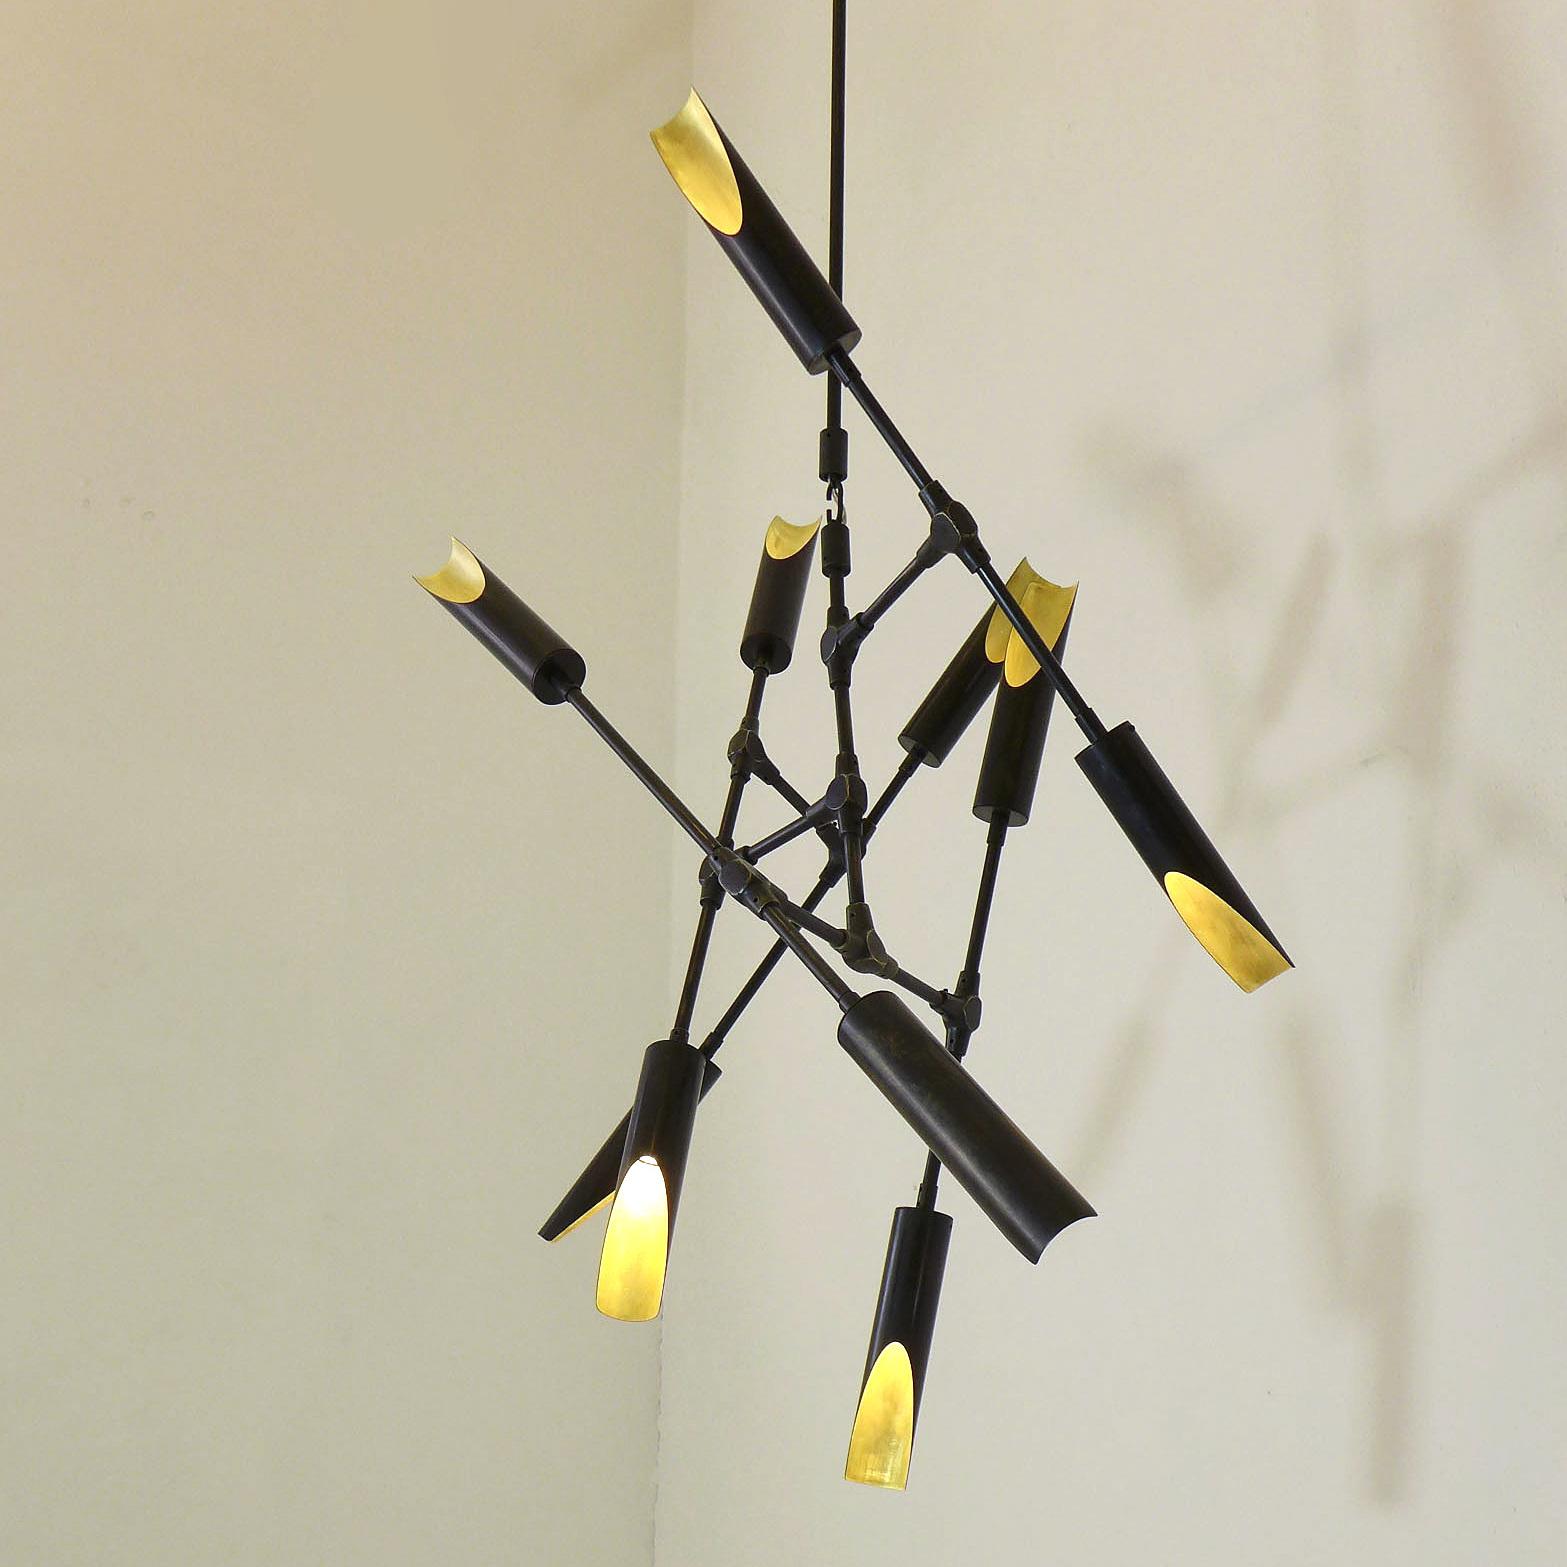 tubular-chandelier-theirry-jeannot-brass2-marion-friedmann-gallery.jpg